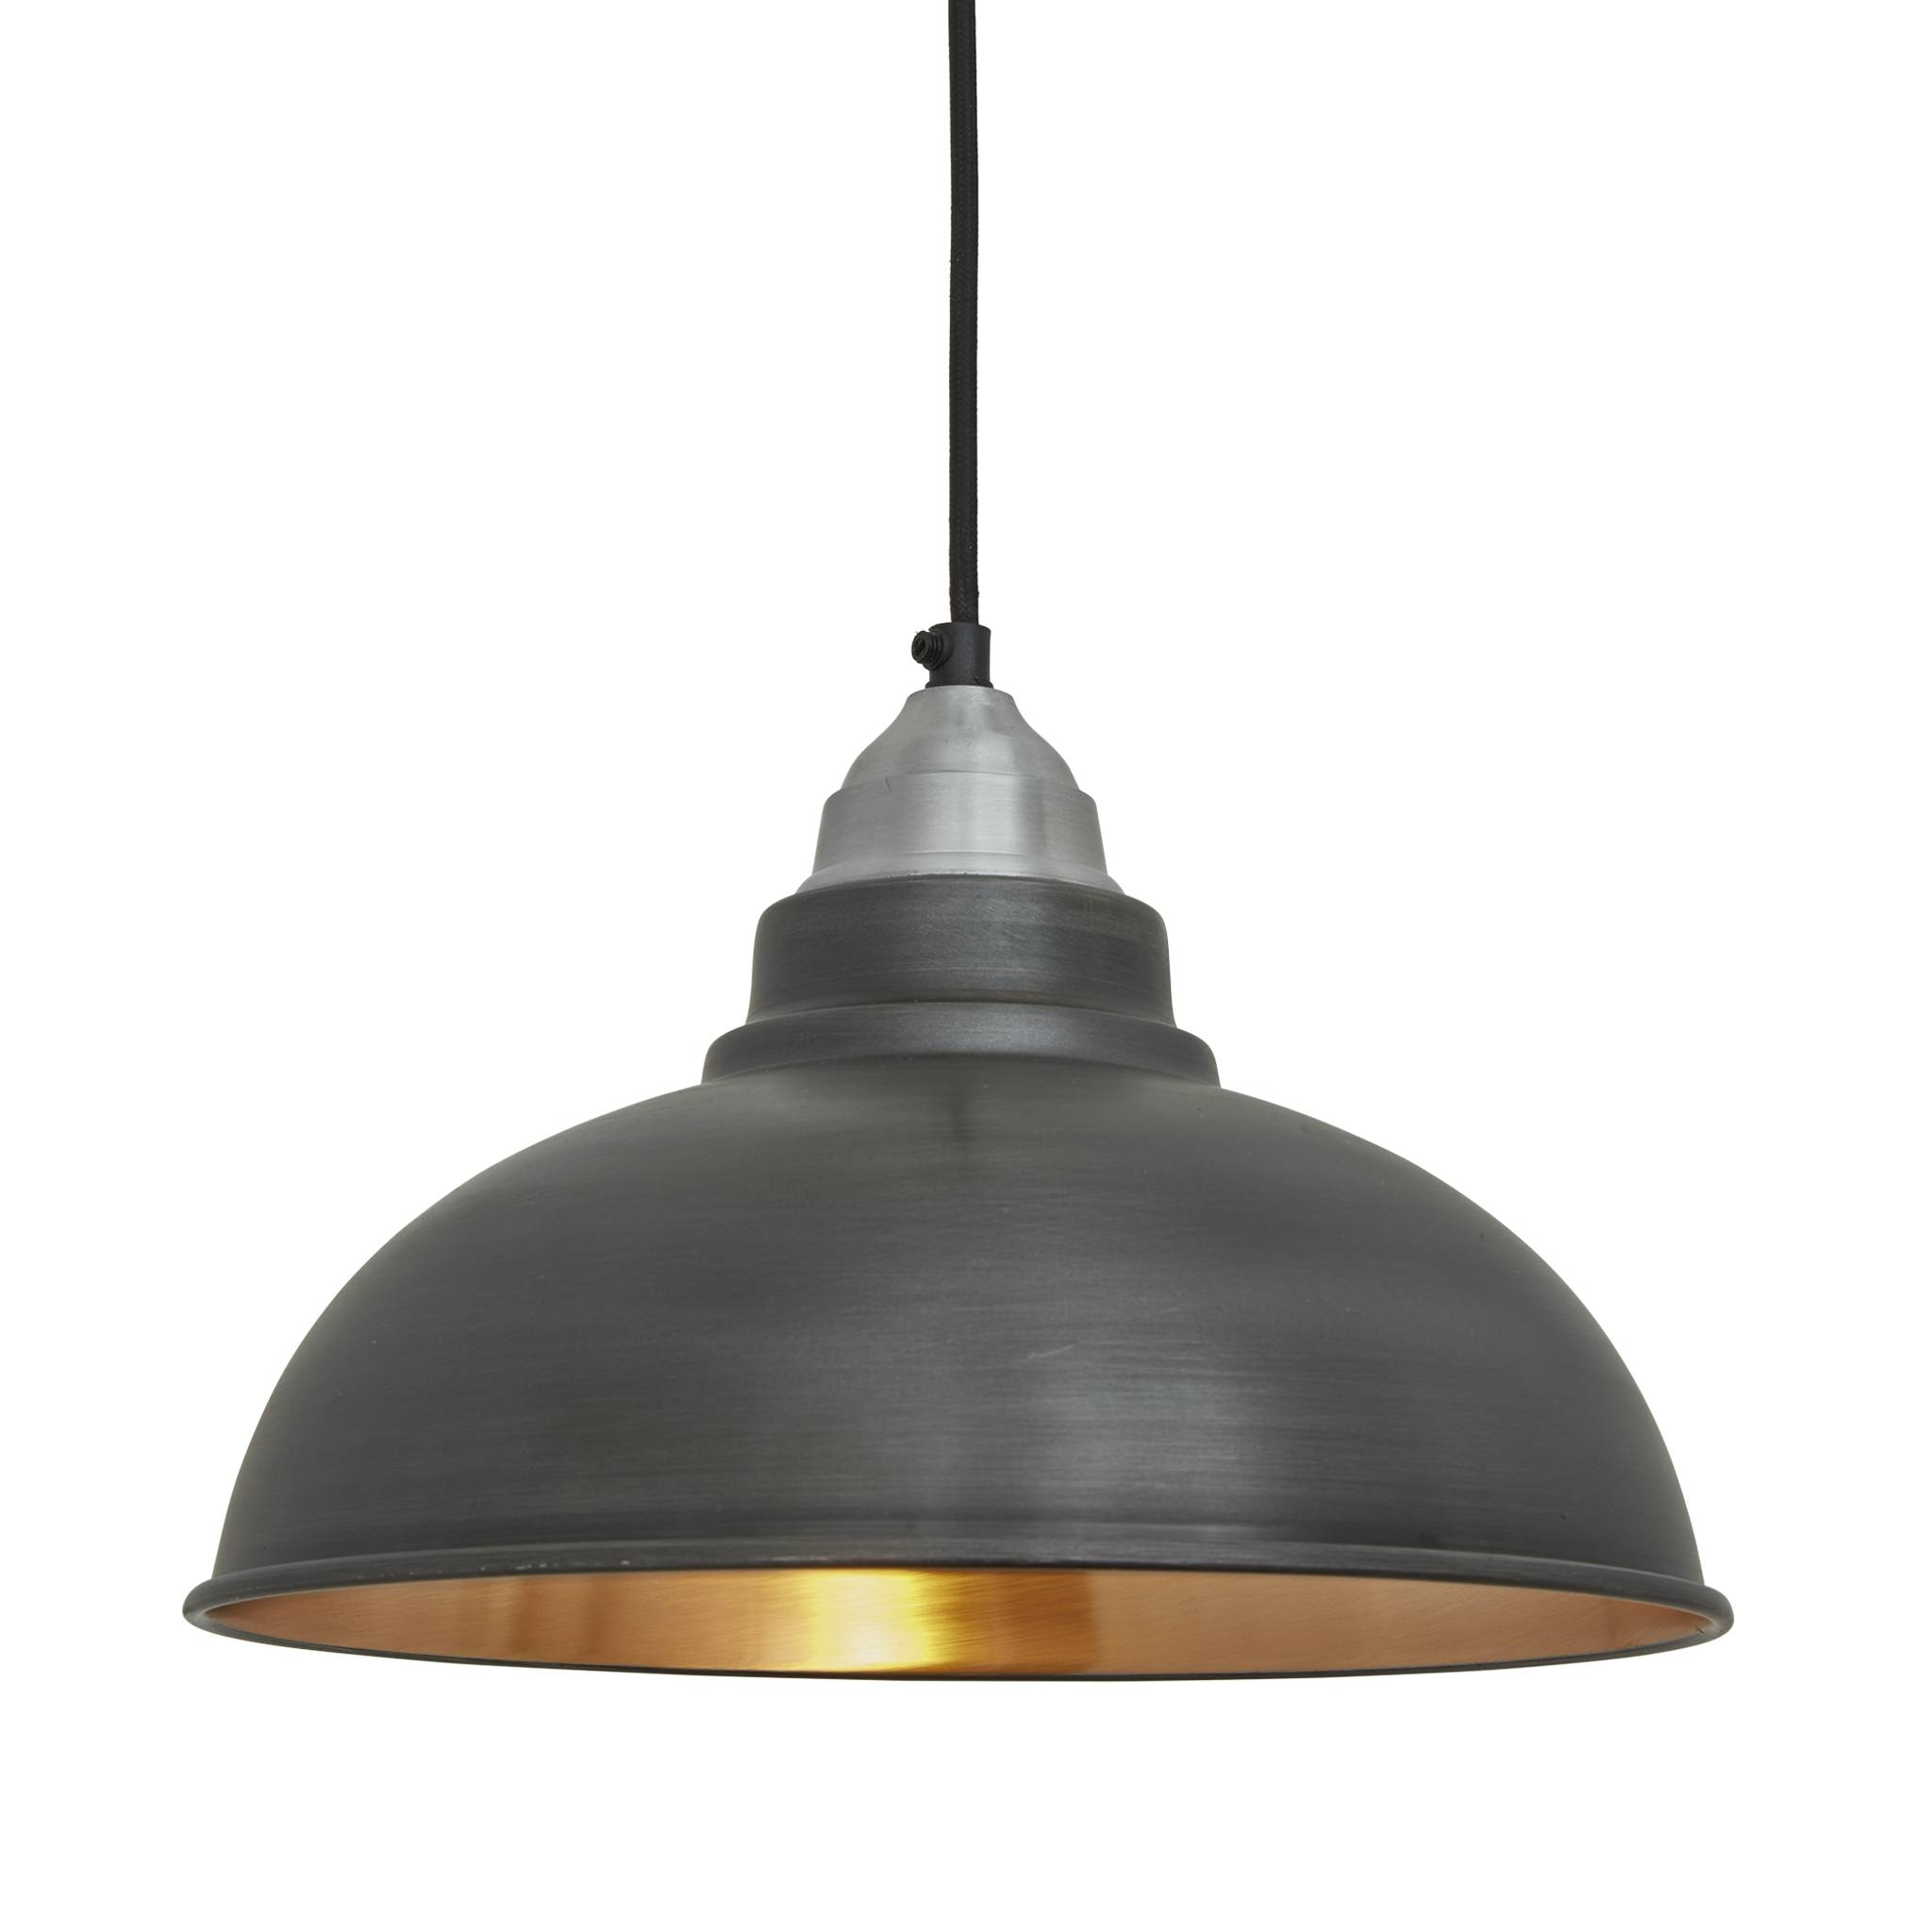 top 15 of battery operated pendant lights. Black Bedroom Furniture Sets. Home Design Ideas